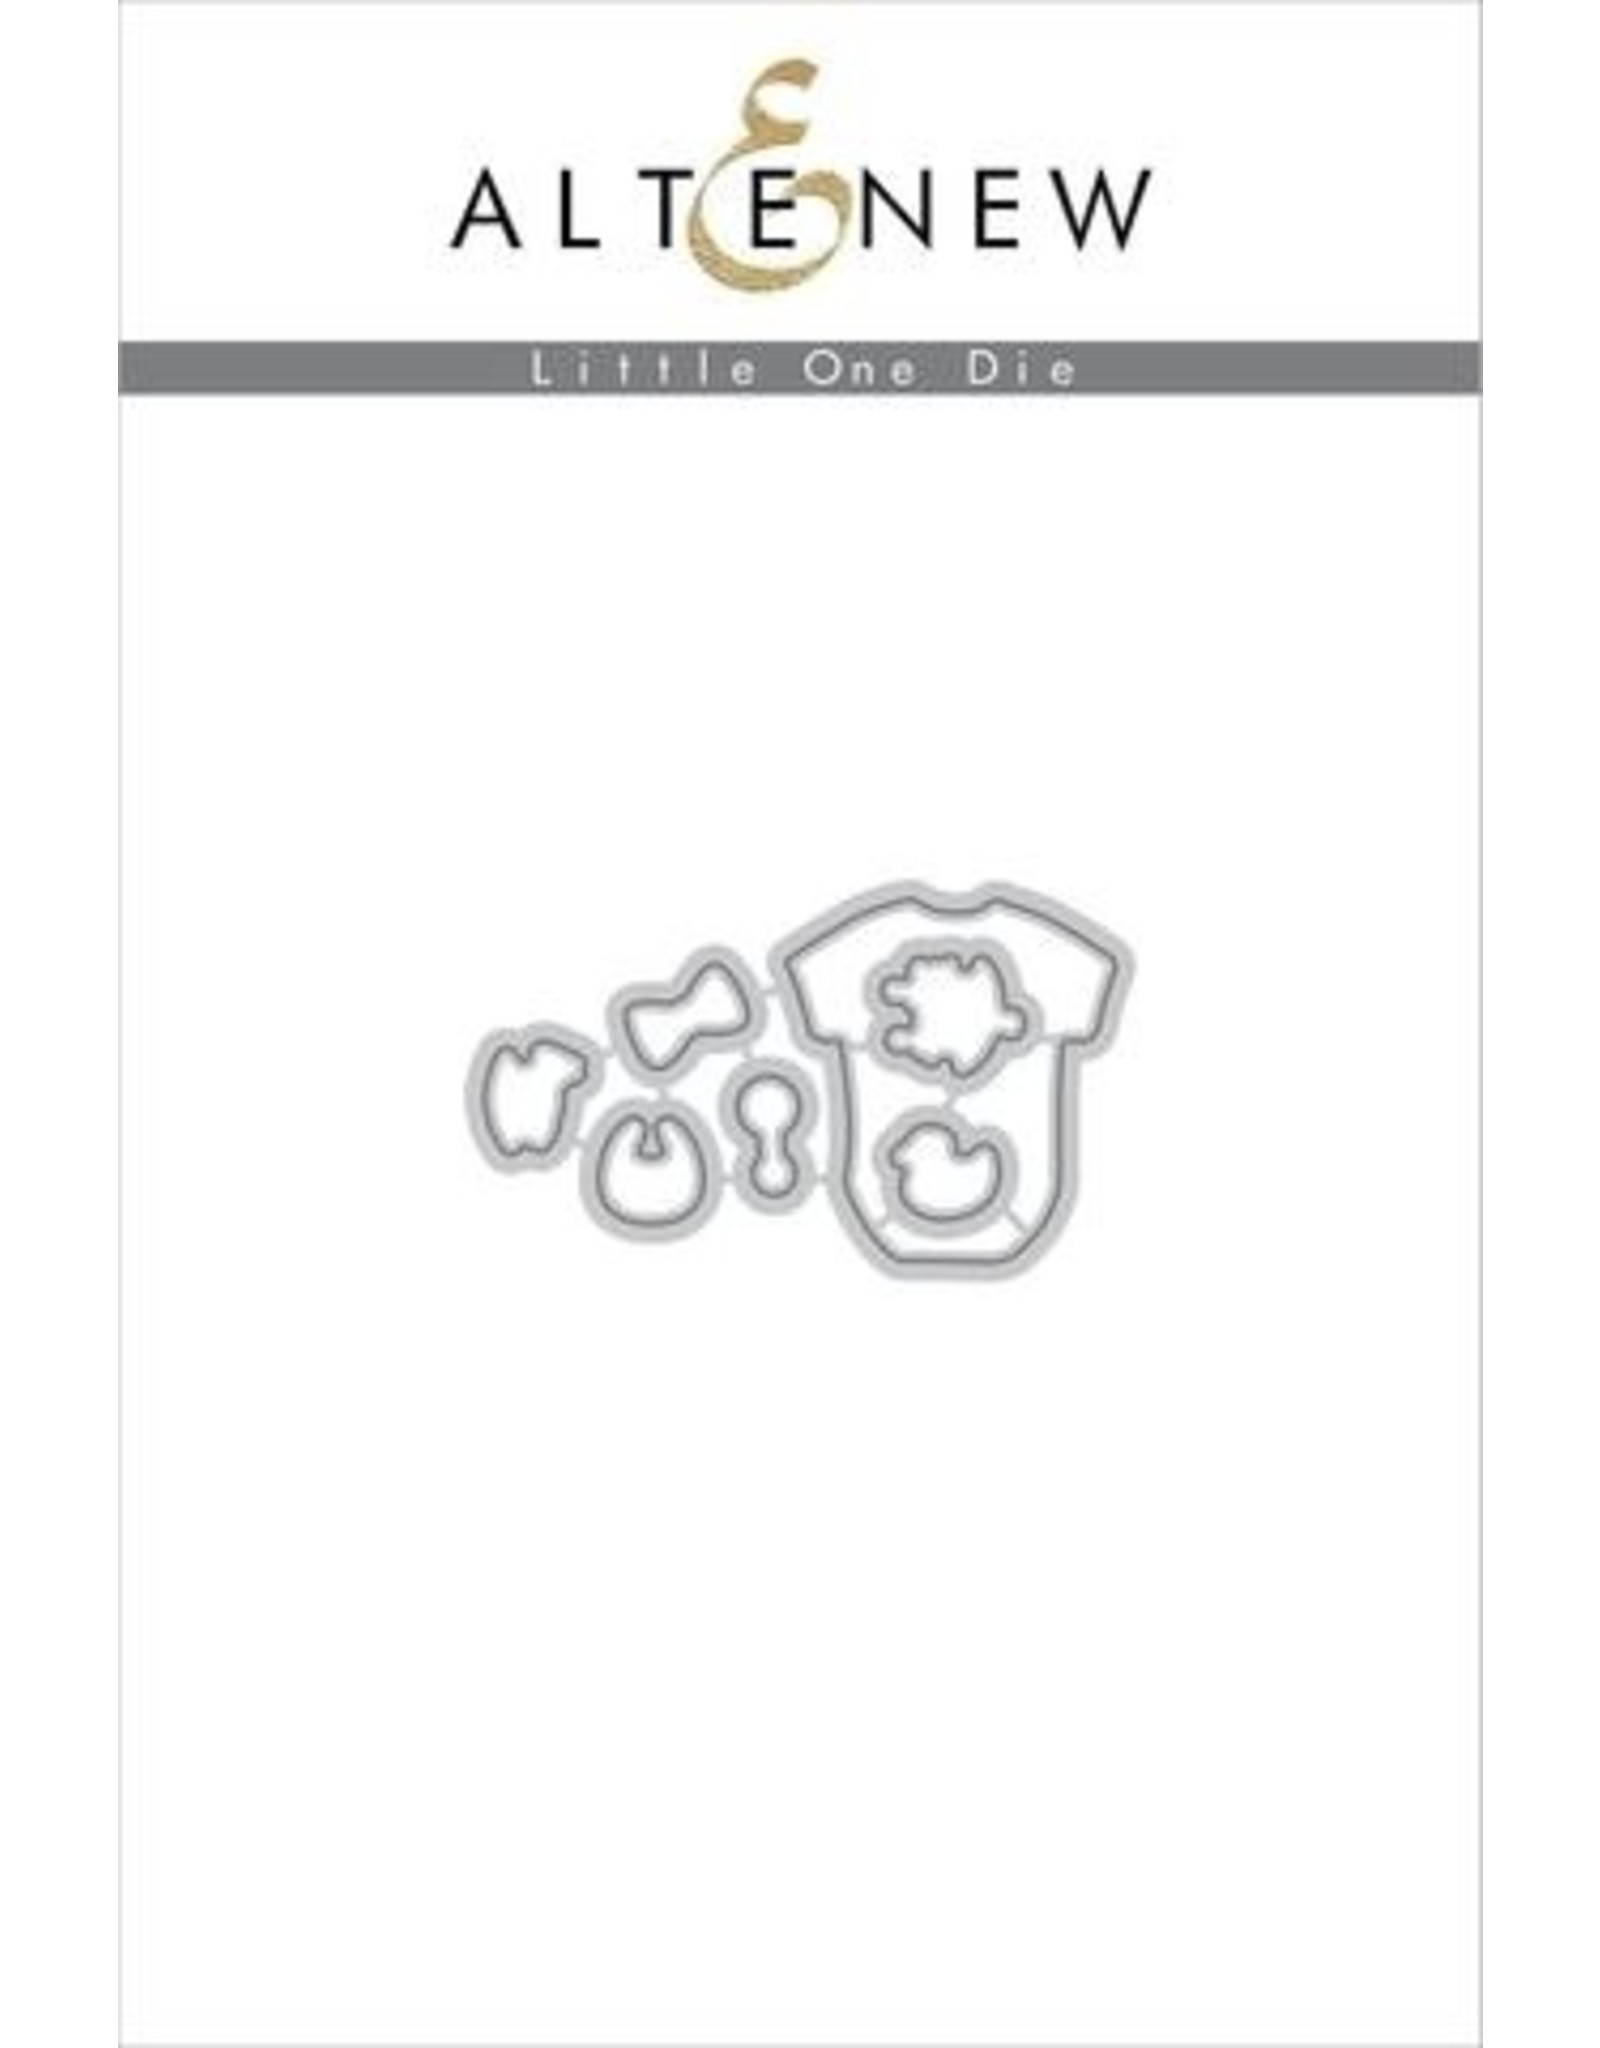 Altenew Little One - Clear Stamp Set